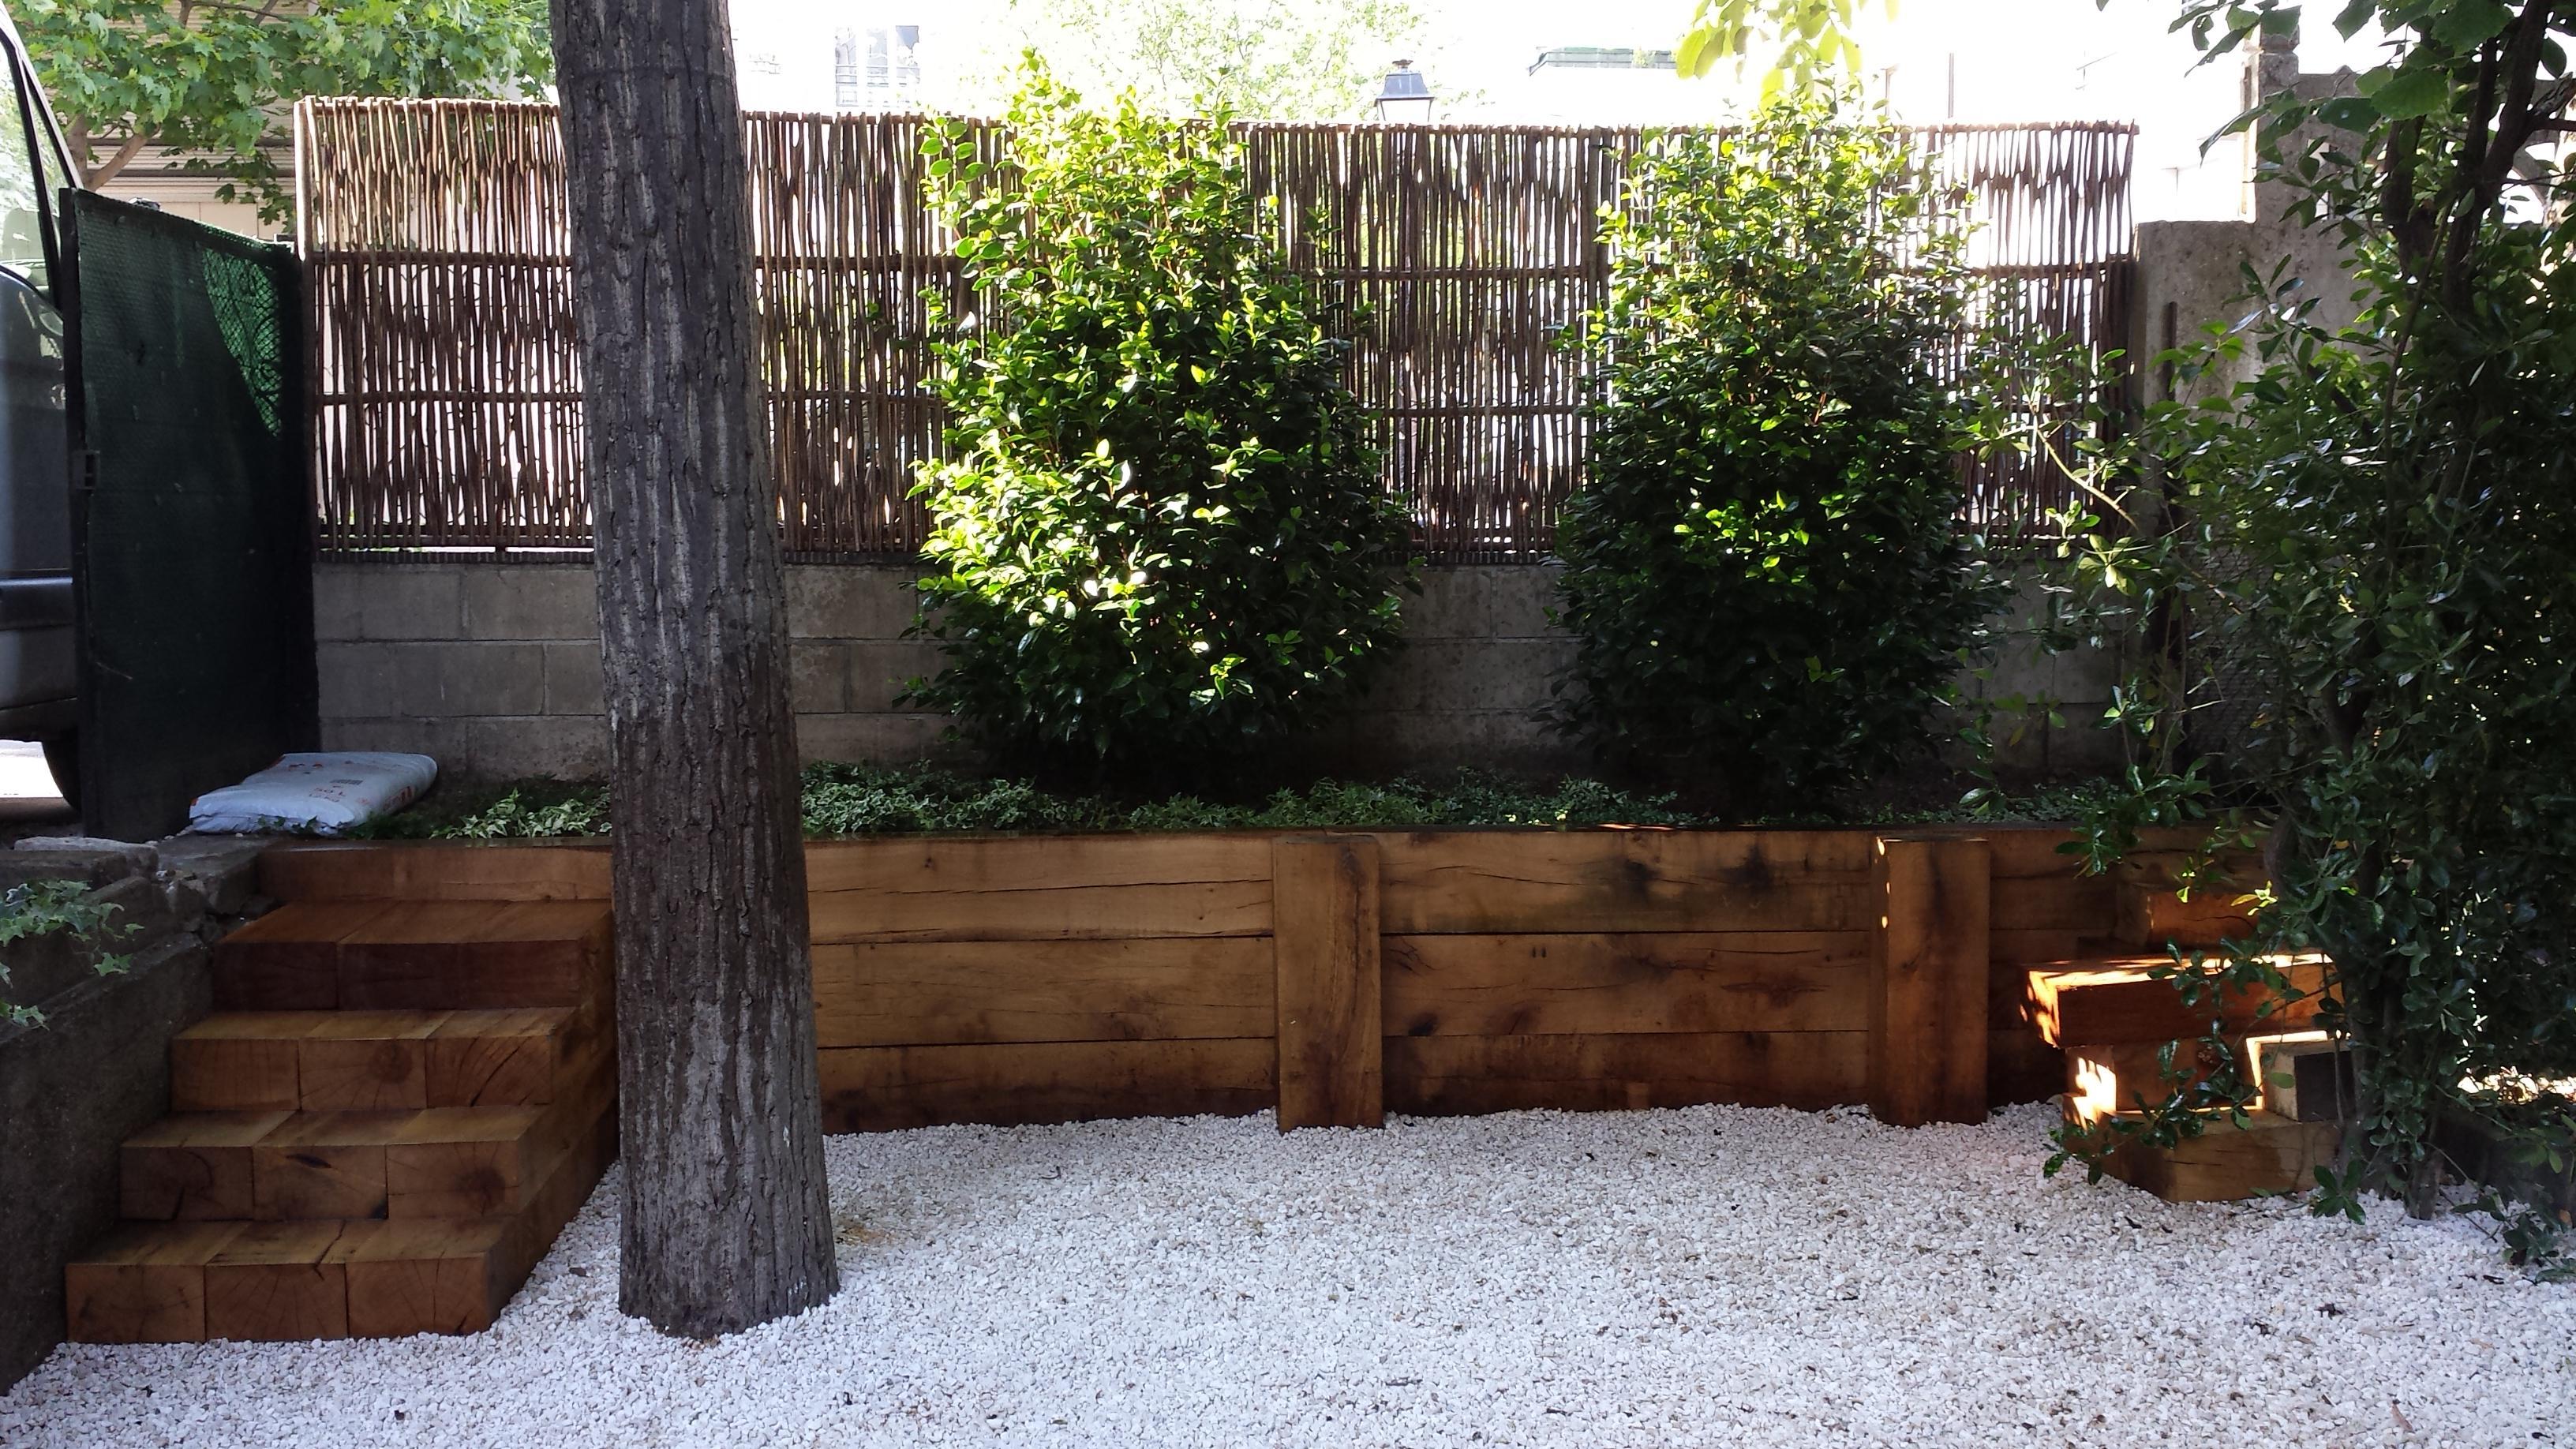 Réaménagement de jardin